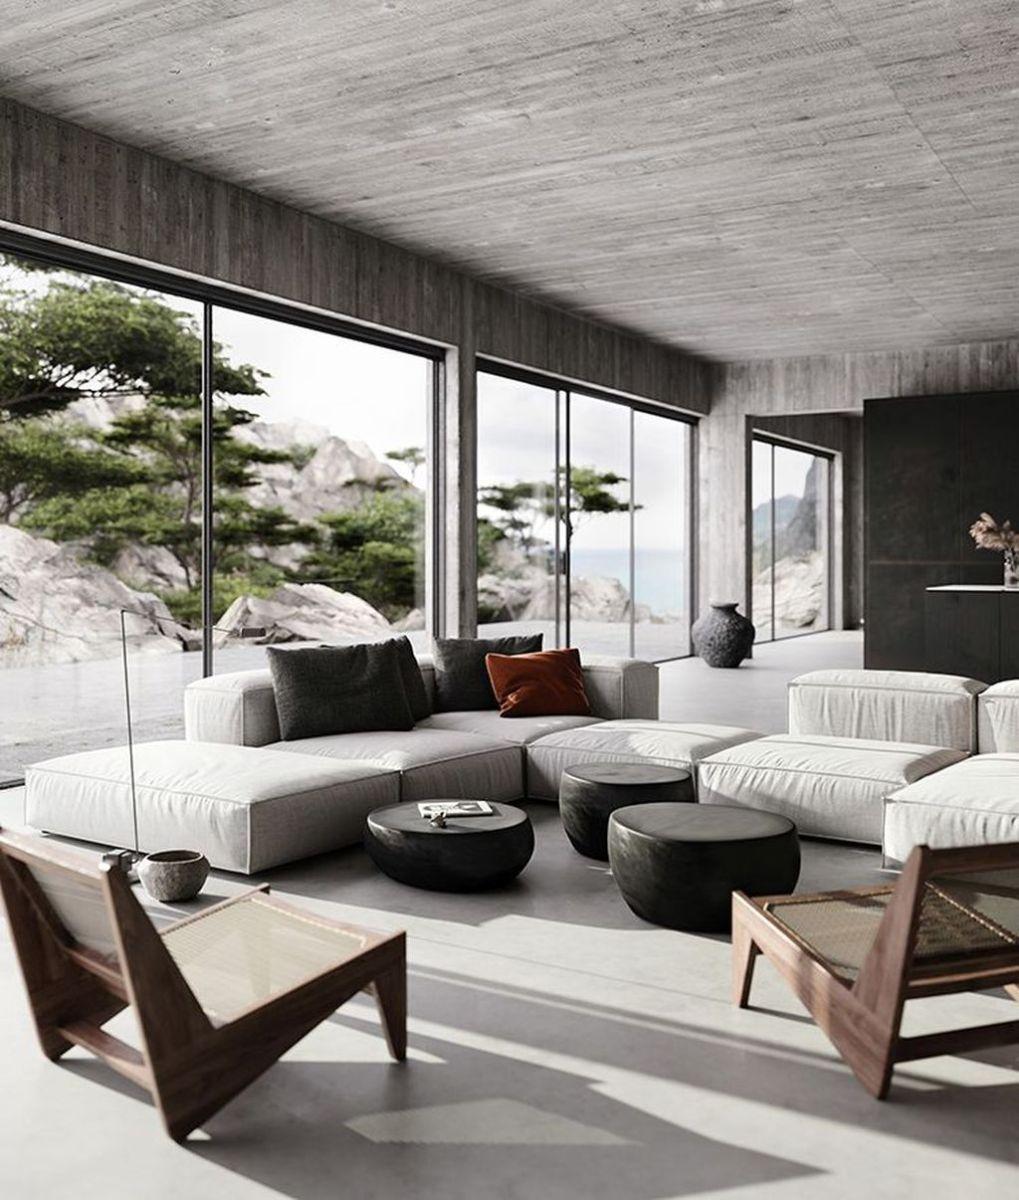 Beautiful Contemporary Interior Design Ideas You Never Seen Before 19